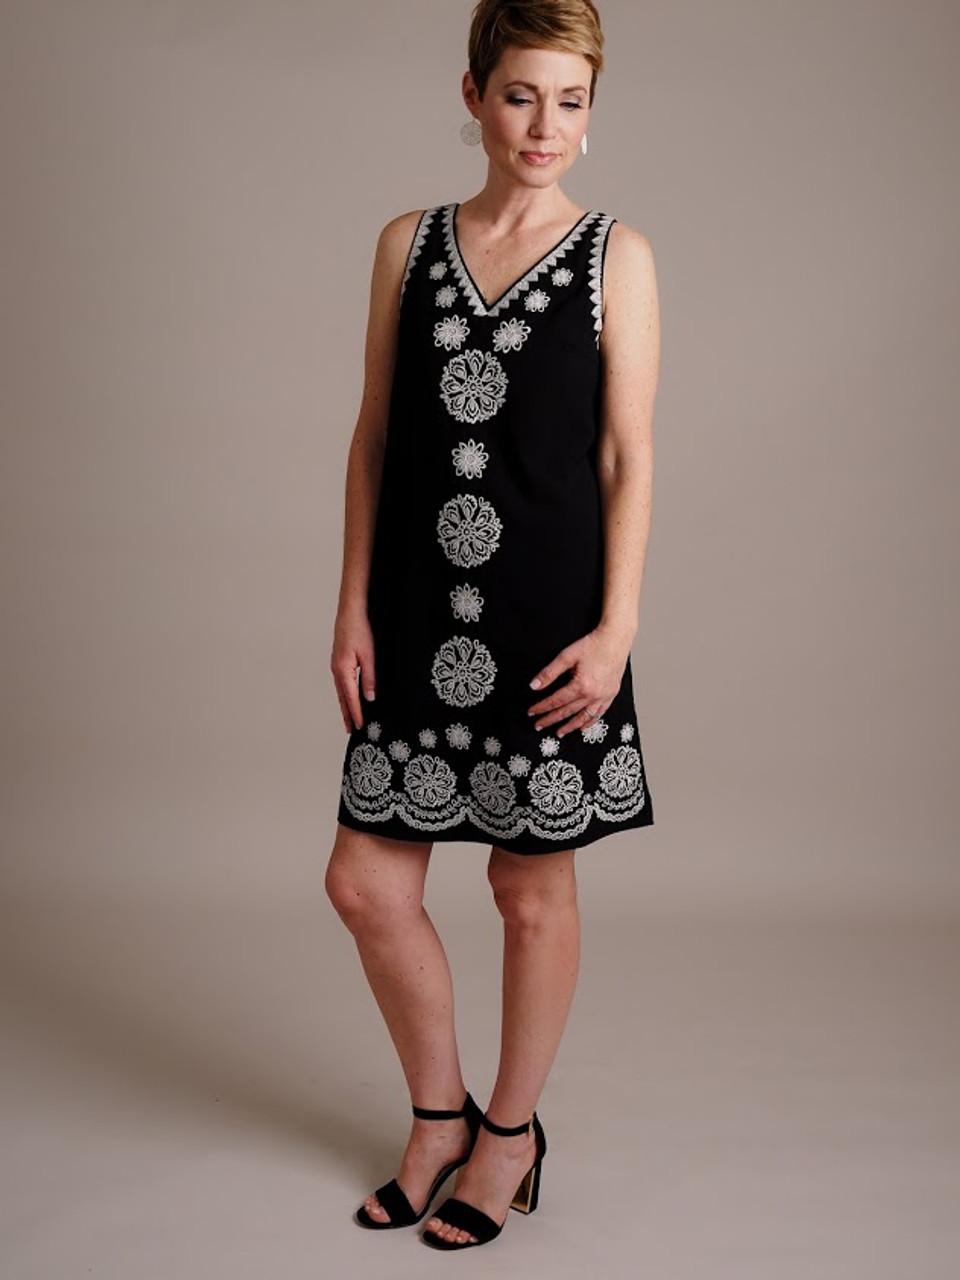 Black Embroidered Shift Dress